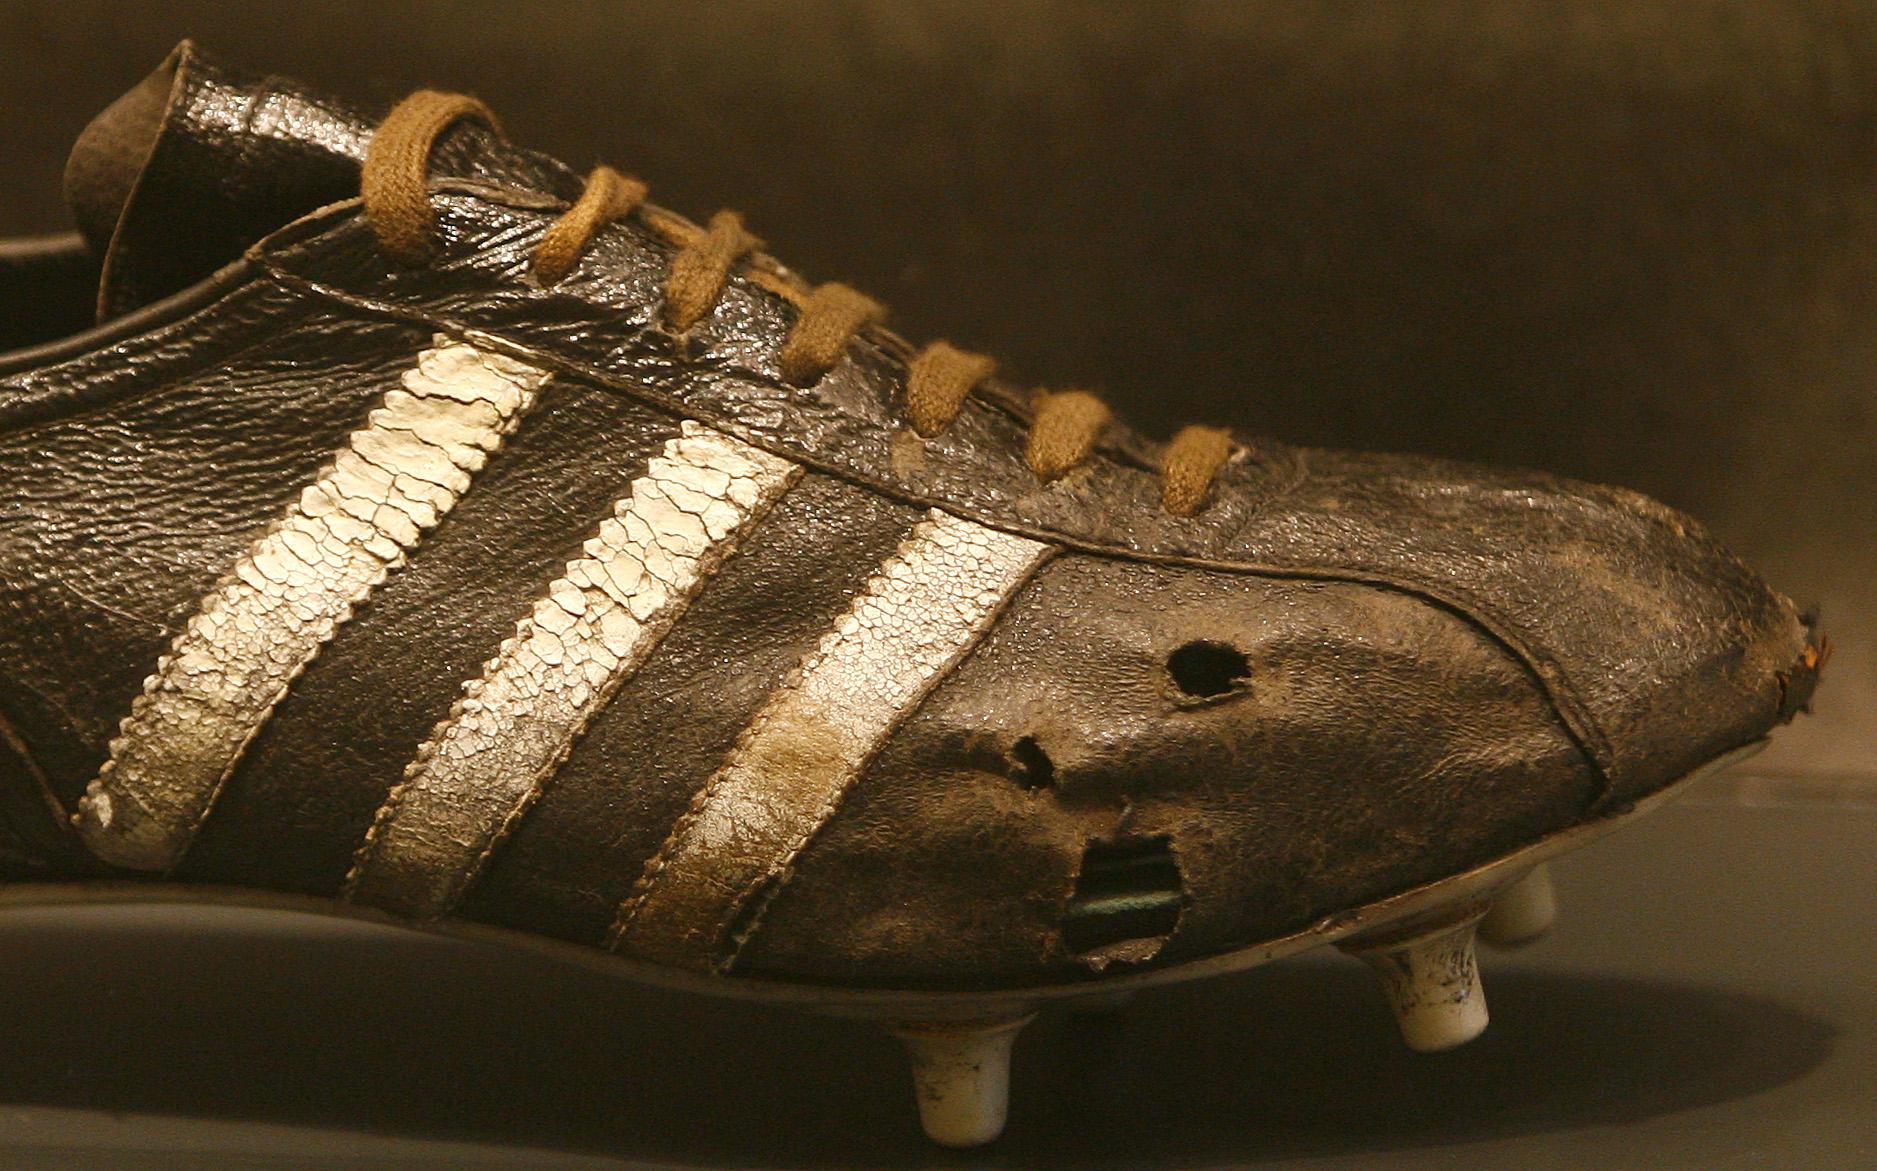 6a4ad575d3 Adidas has sued pretty much everyone who has used stripes — Quartzy